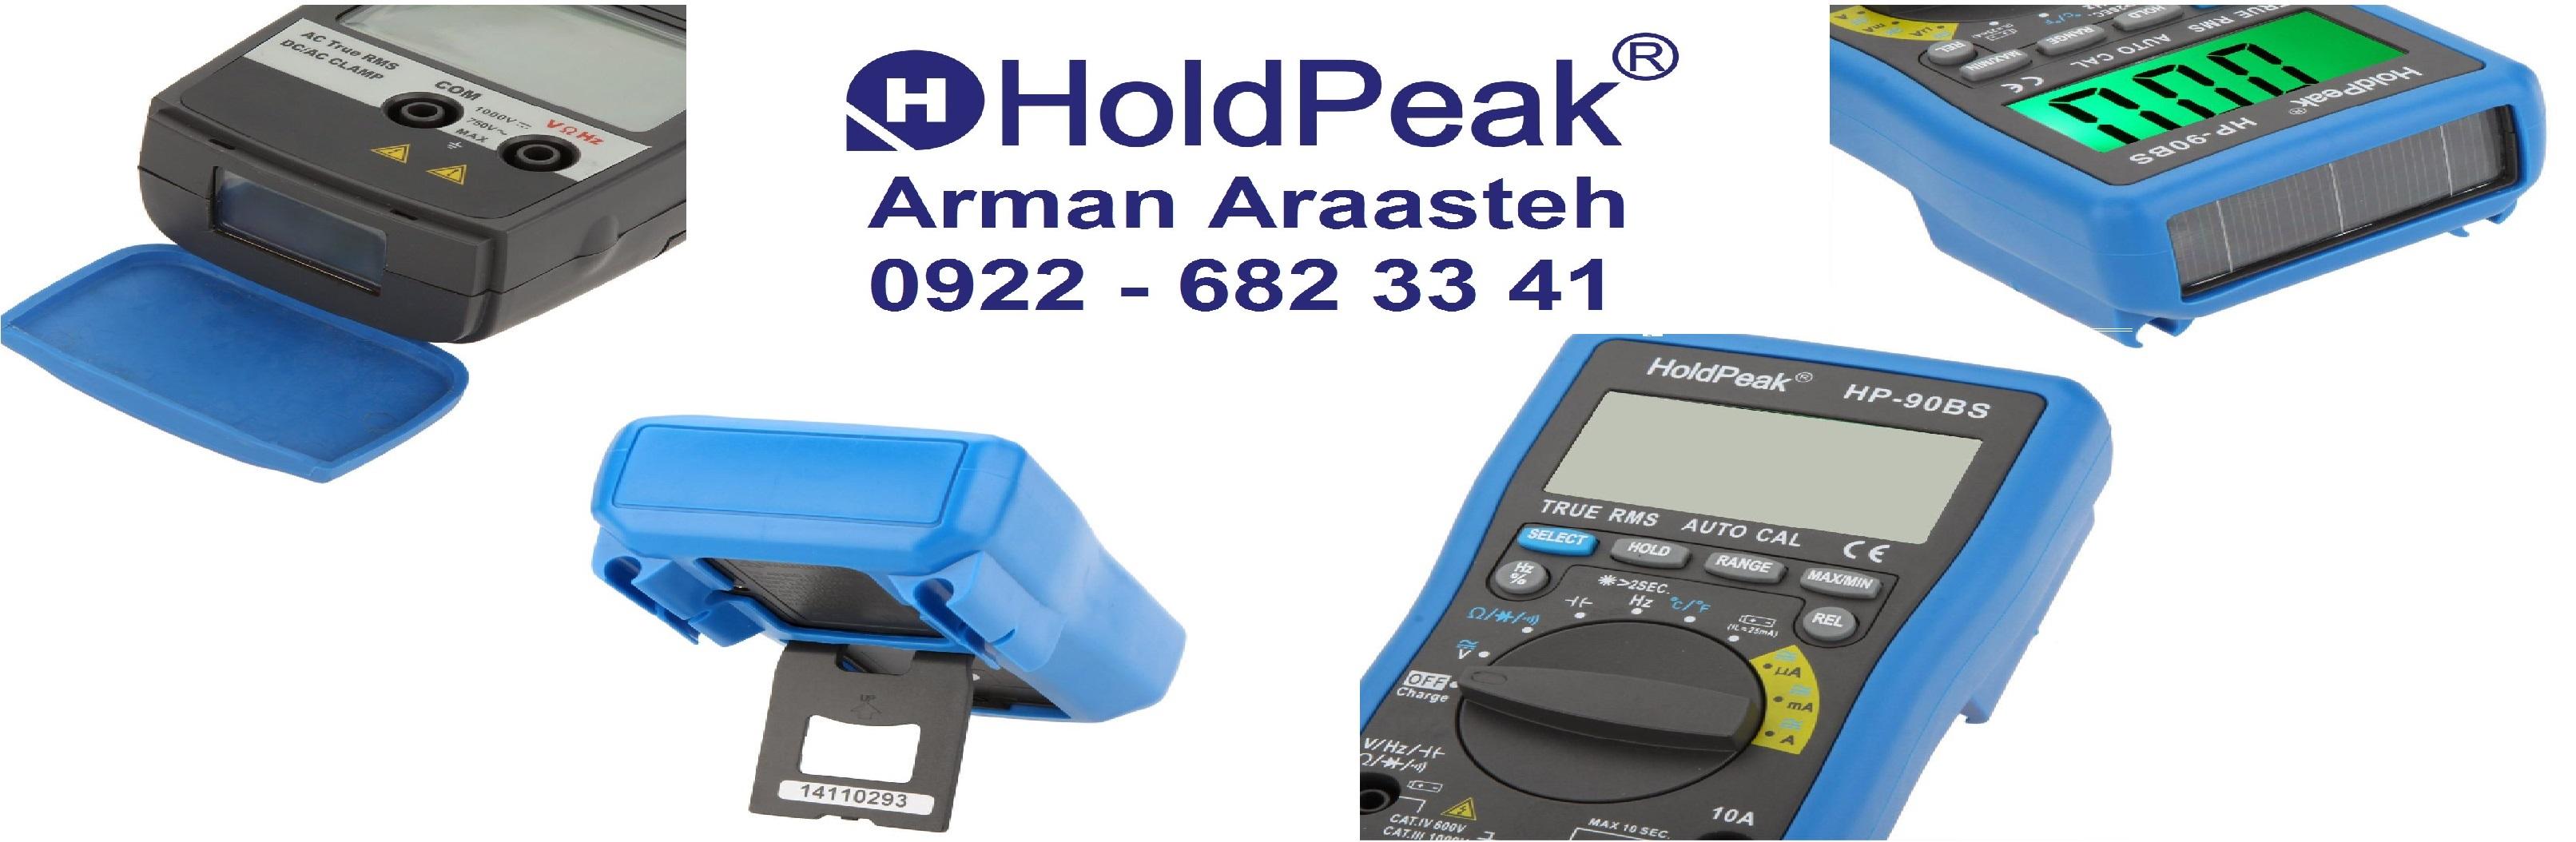 Holdpeak Infrared Thermo Hi Tester Hioki Ft3701 20